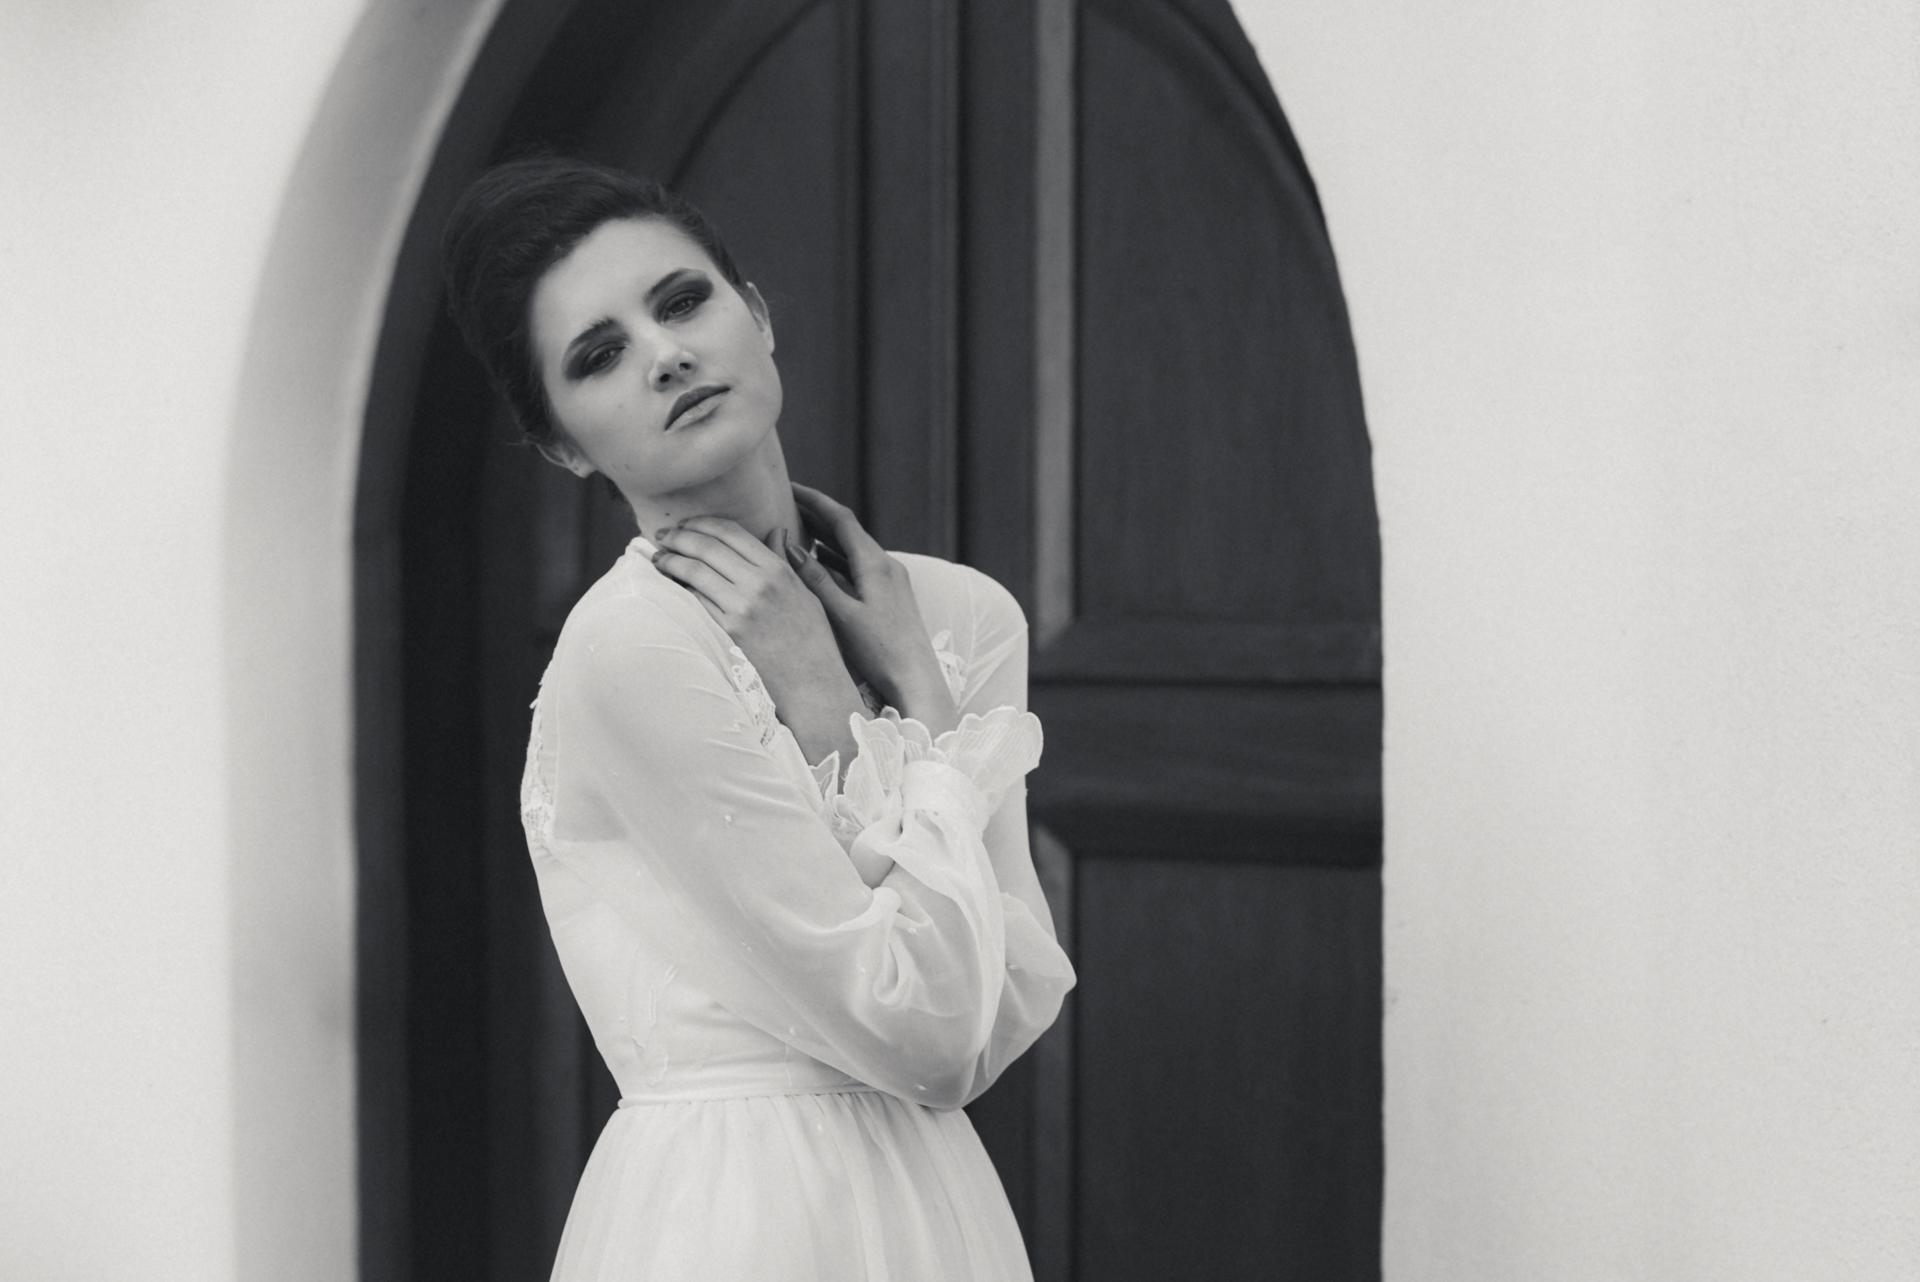 Stephanie de Jager Portraits Listelle -14.jpg